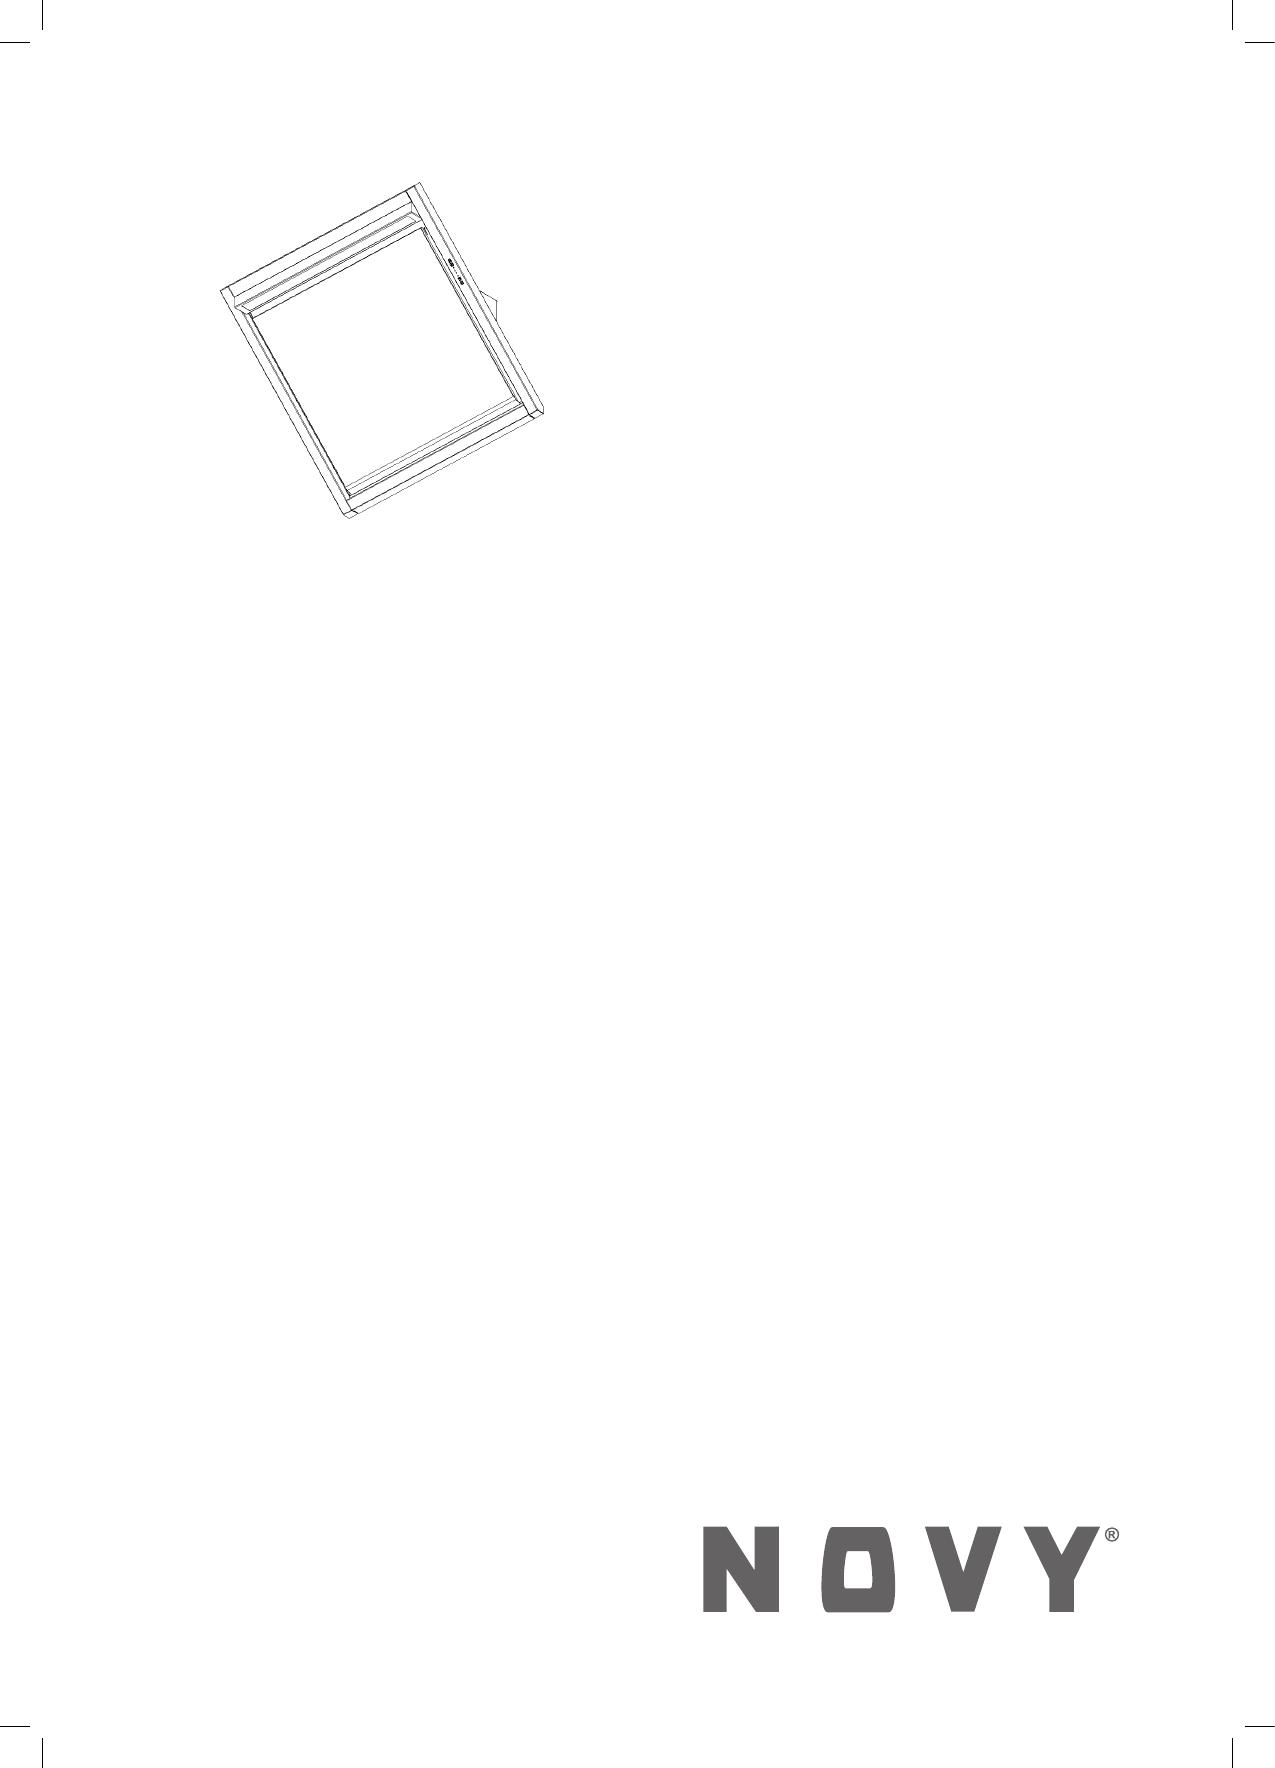 Handleiding Novy 7805 (pagina 12 van 24) (Deutsch, English, Français ...